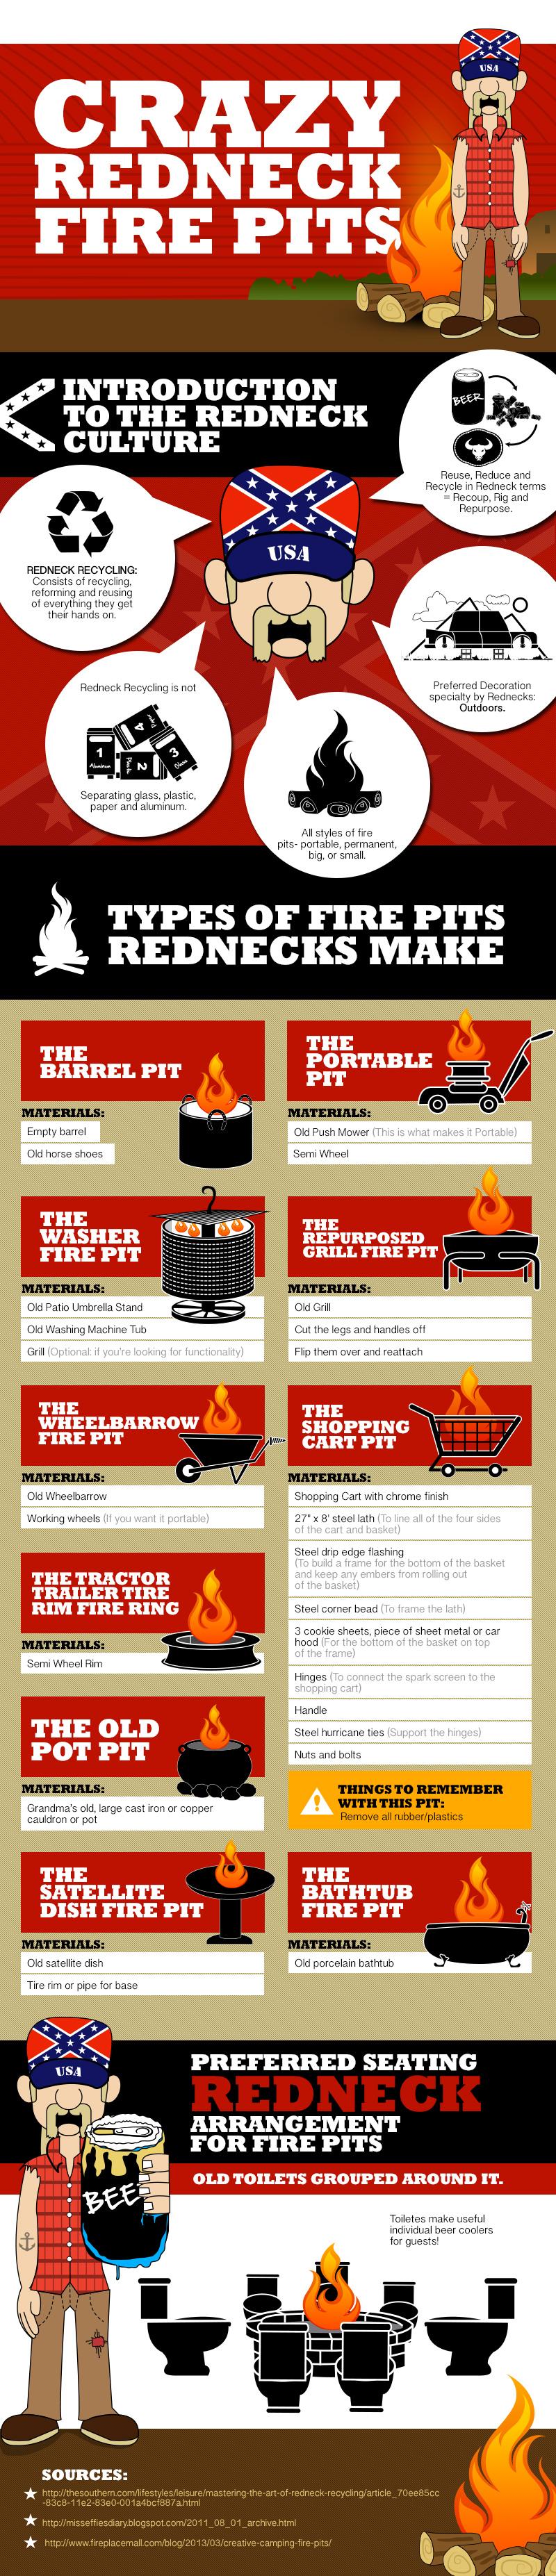 Crazy Redneck Fire Pits